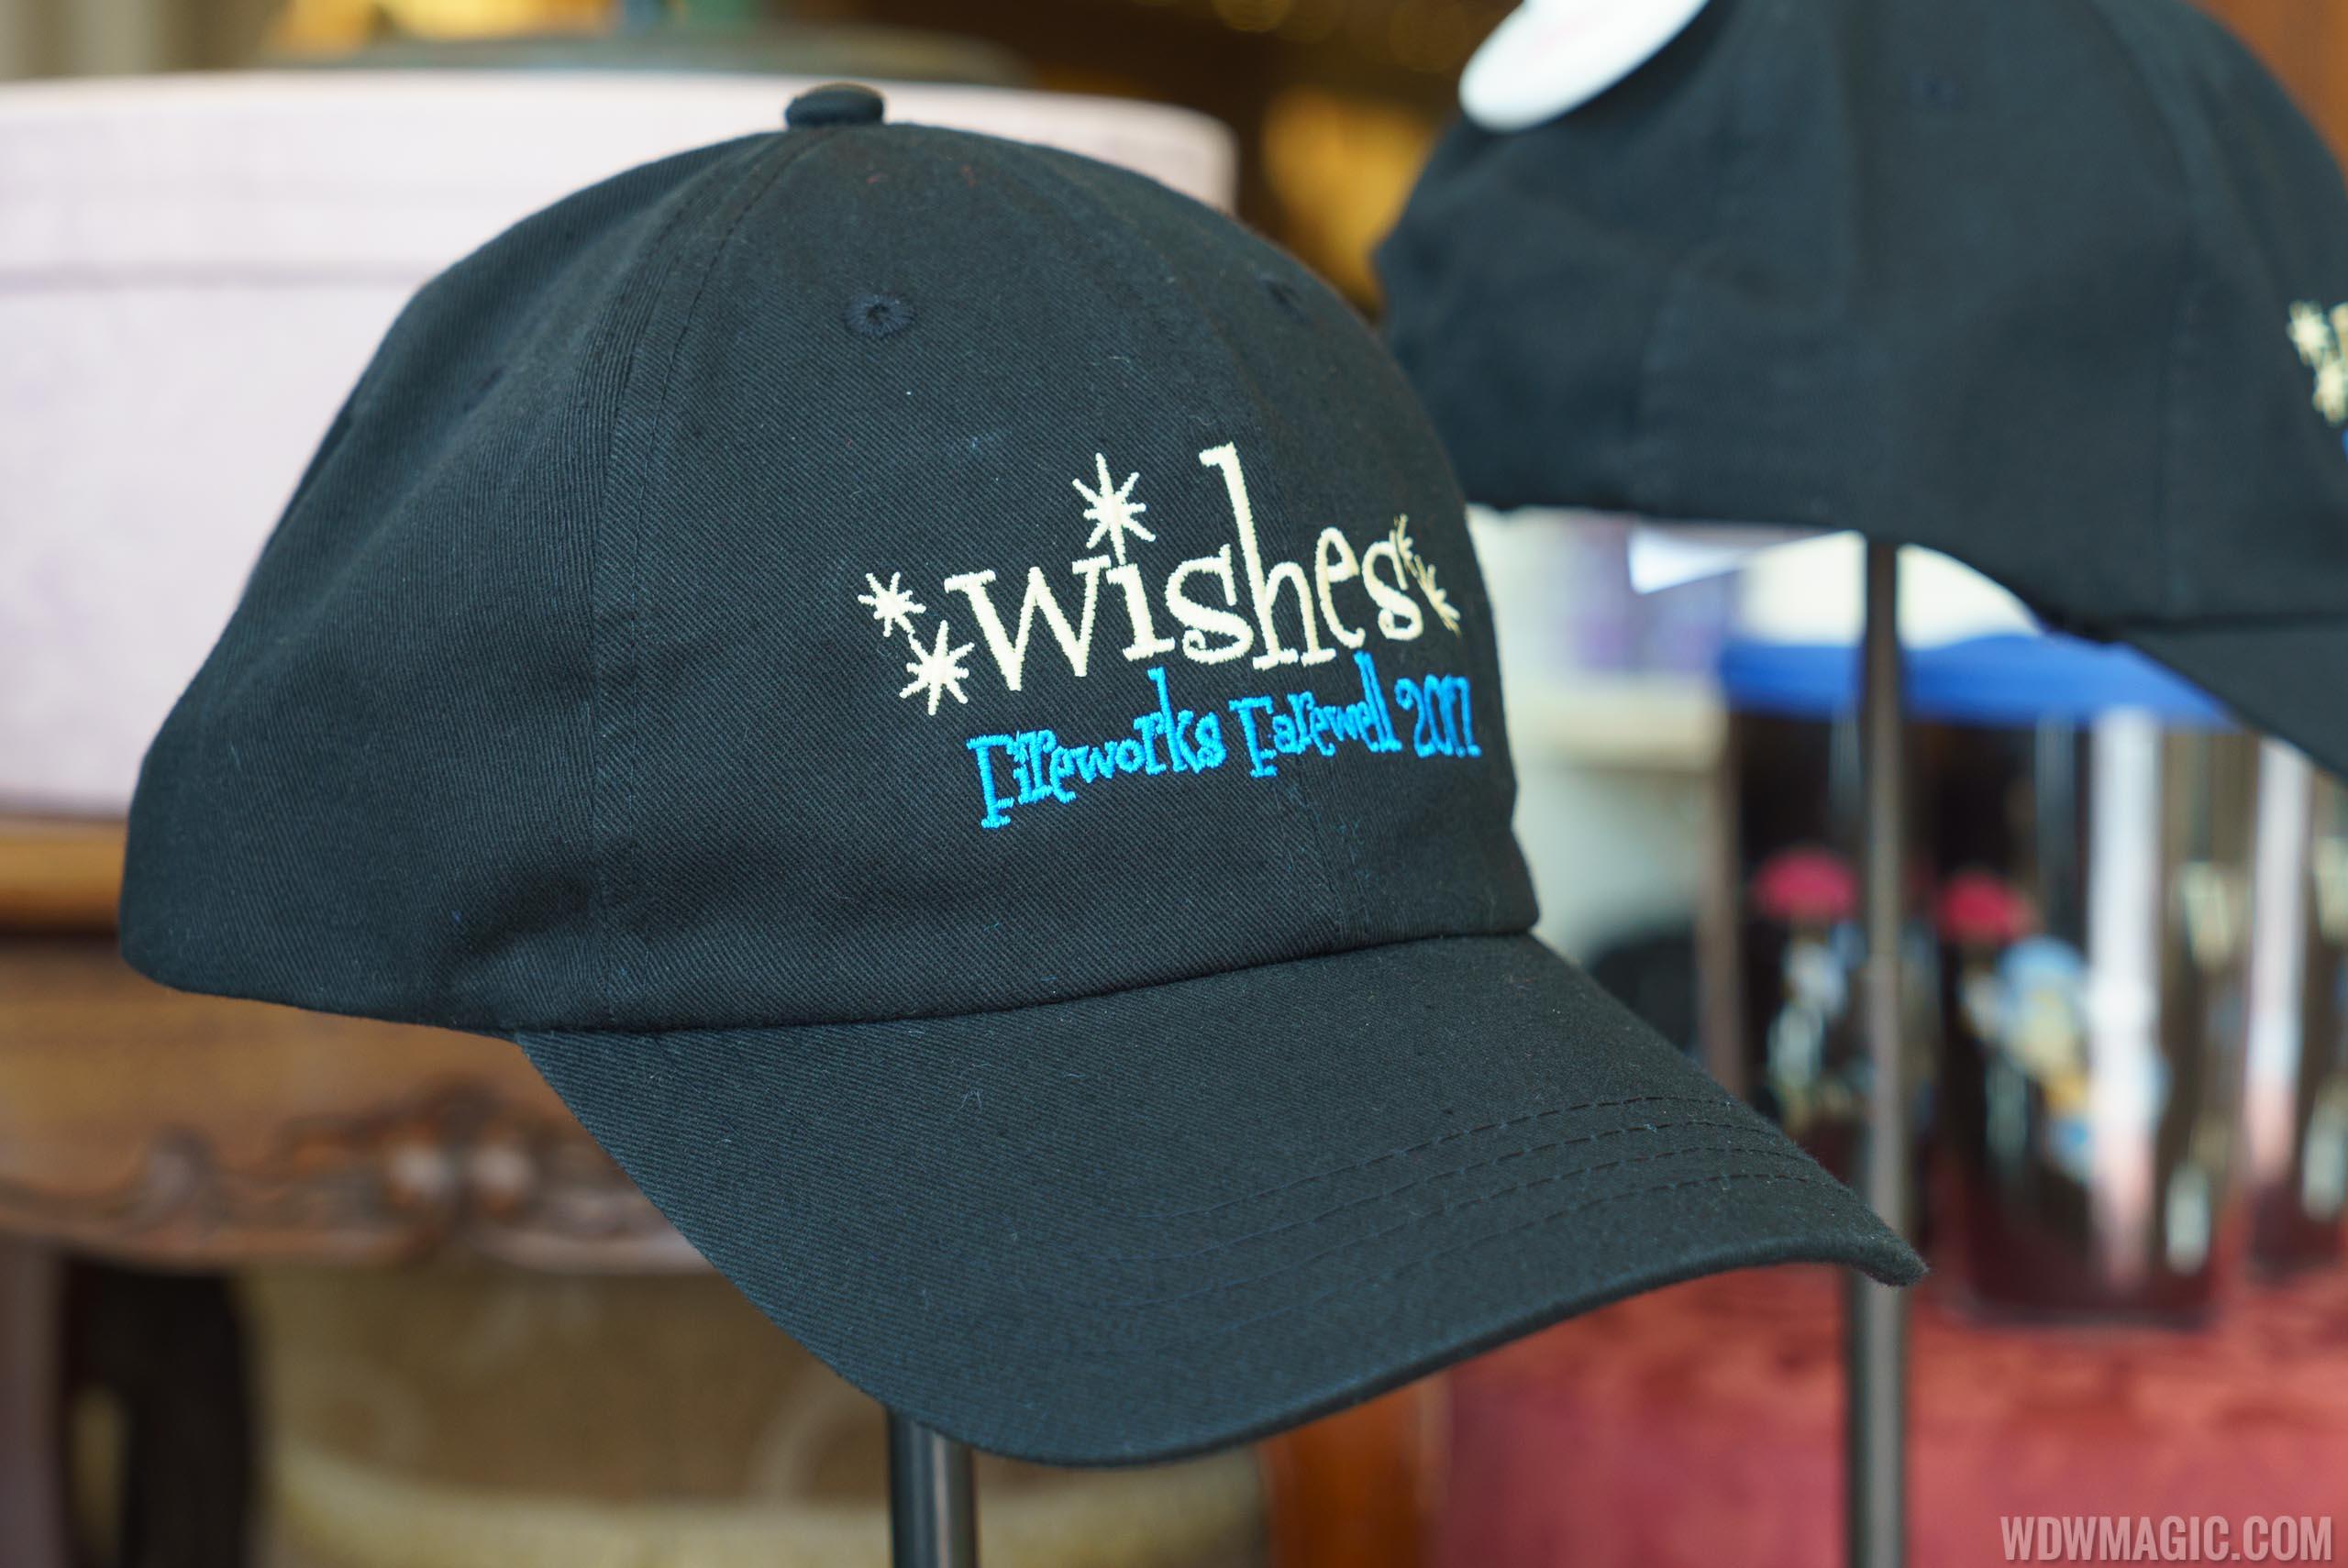 Wishes Farewell merchandise - Baseball Cap